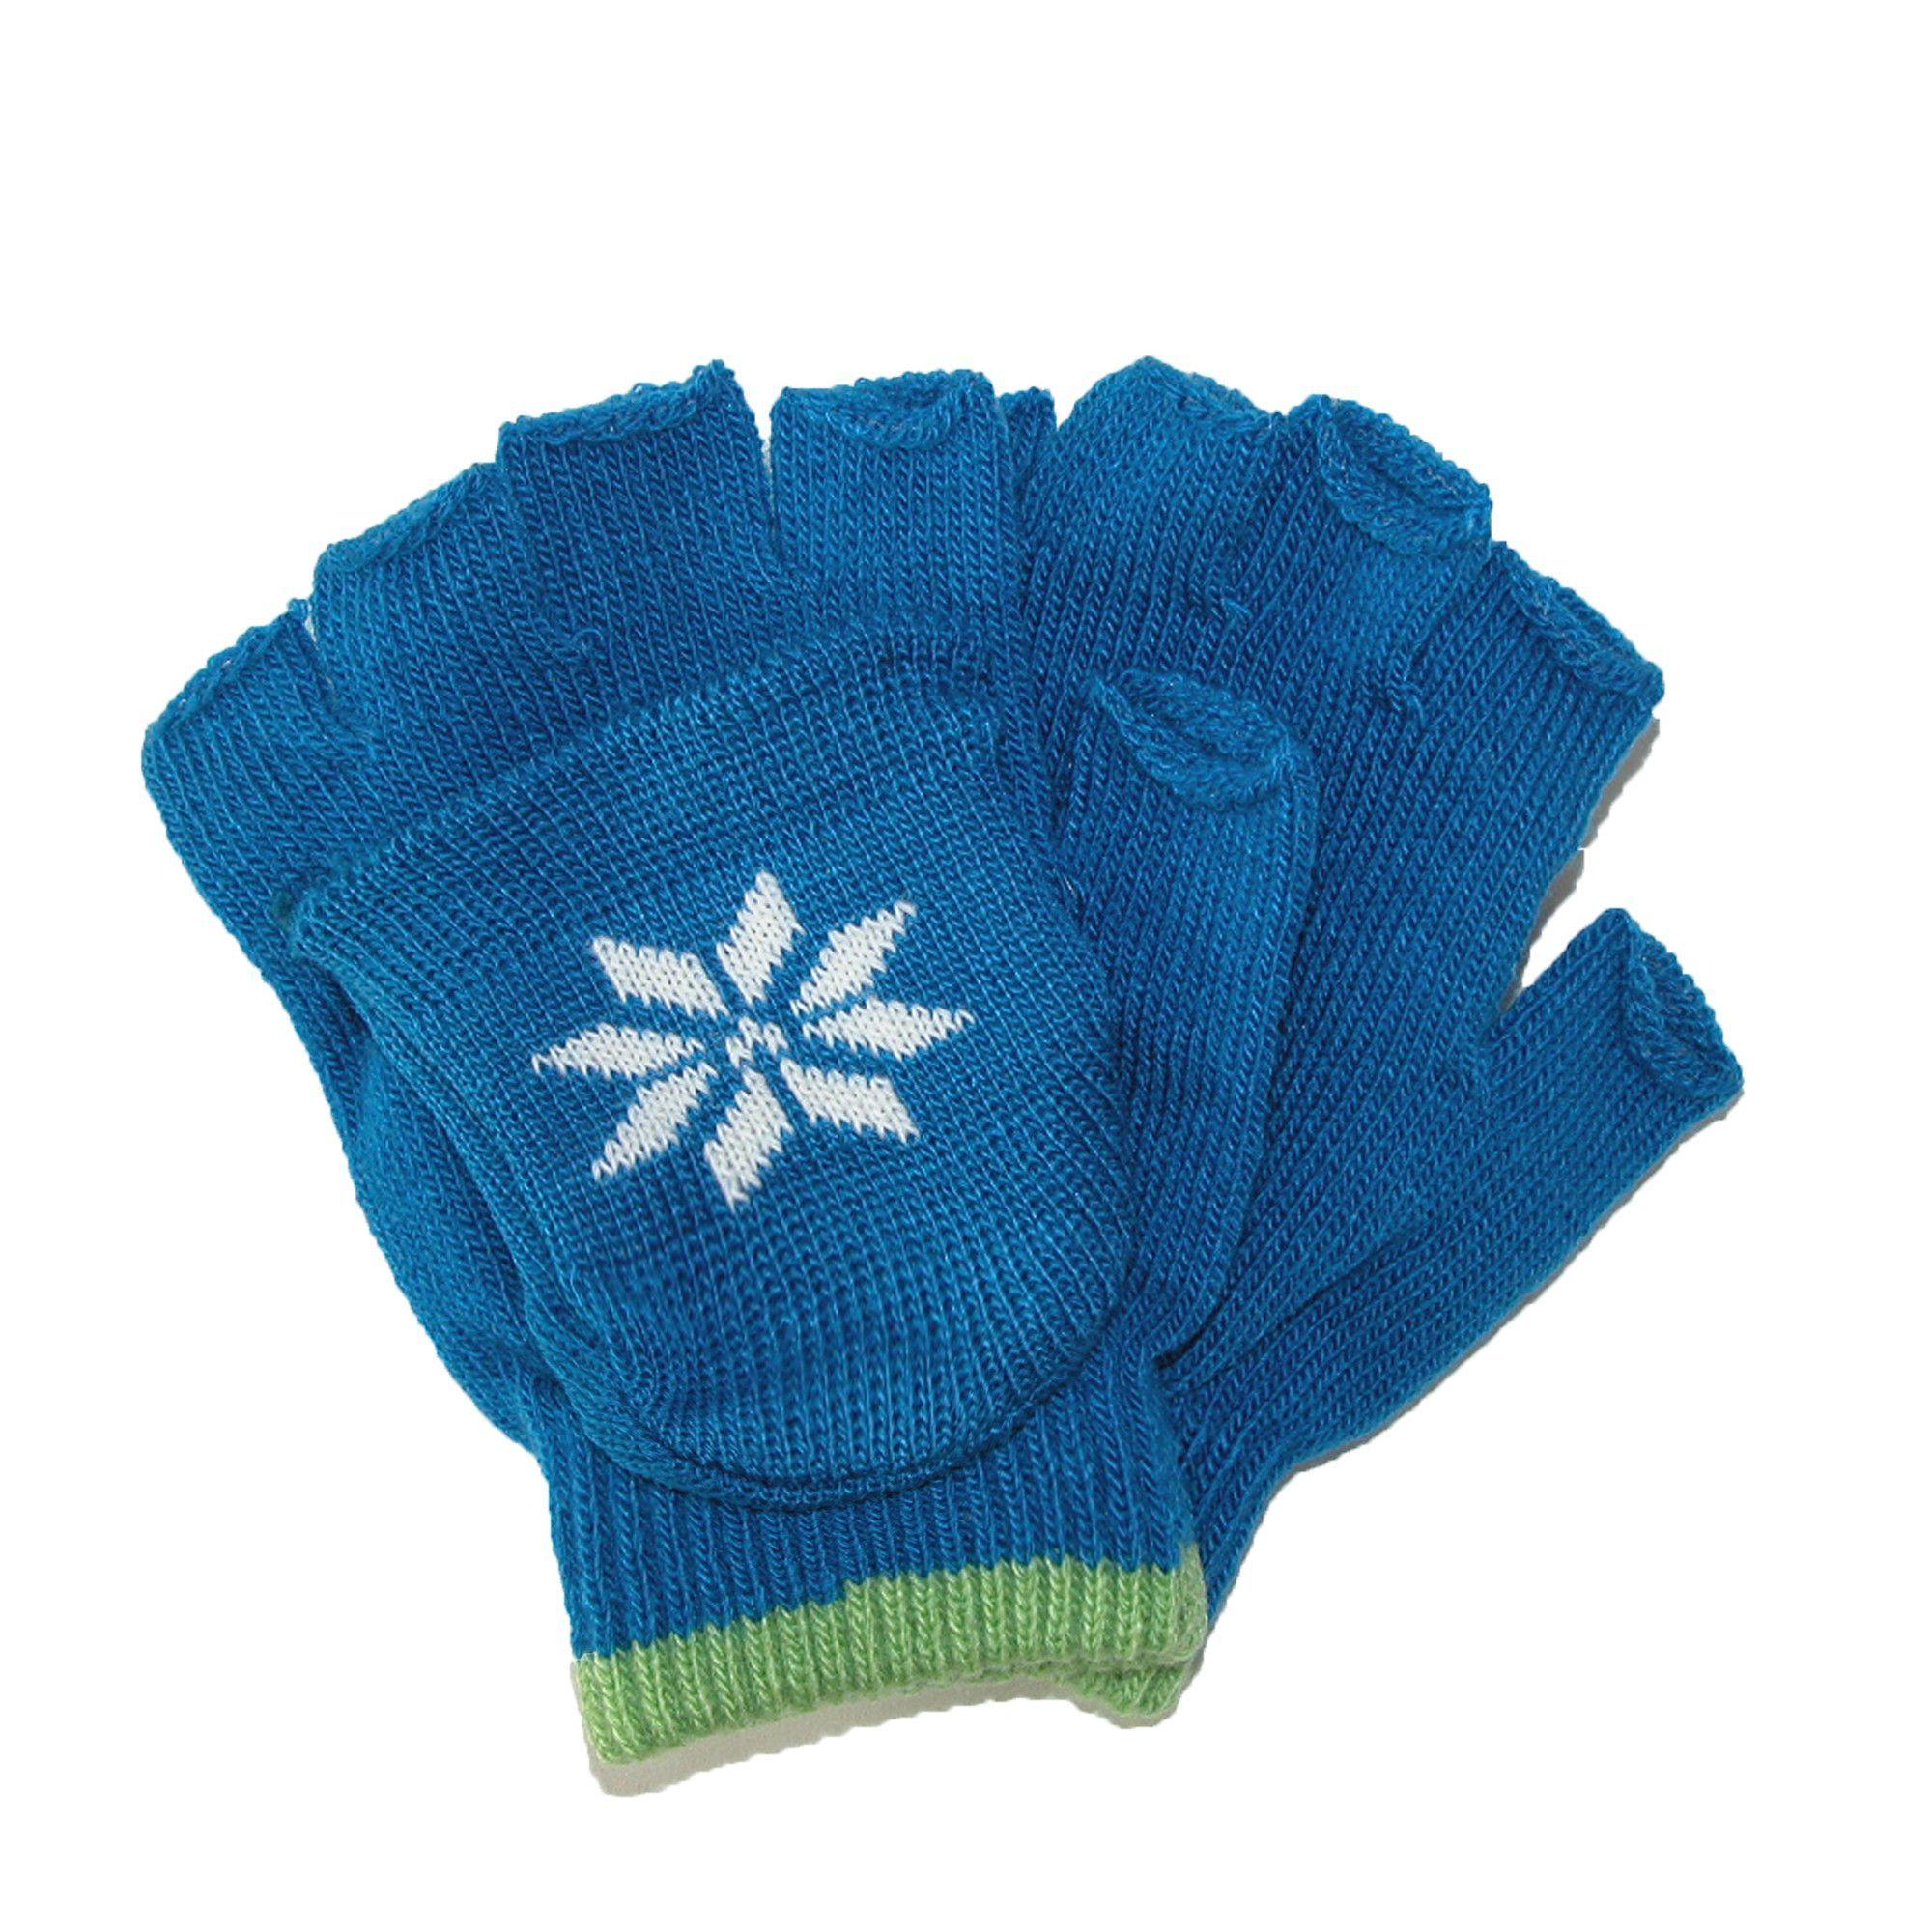 CTM Boys Stretch Convertible Fingerless Winter Gloves